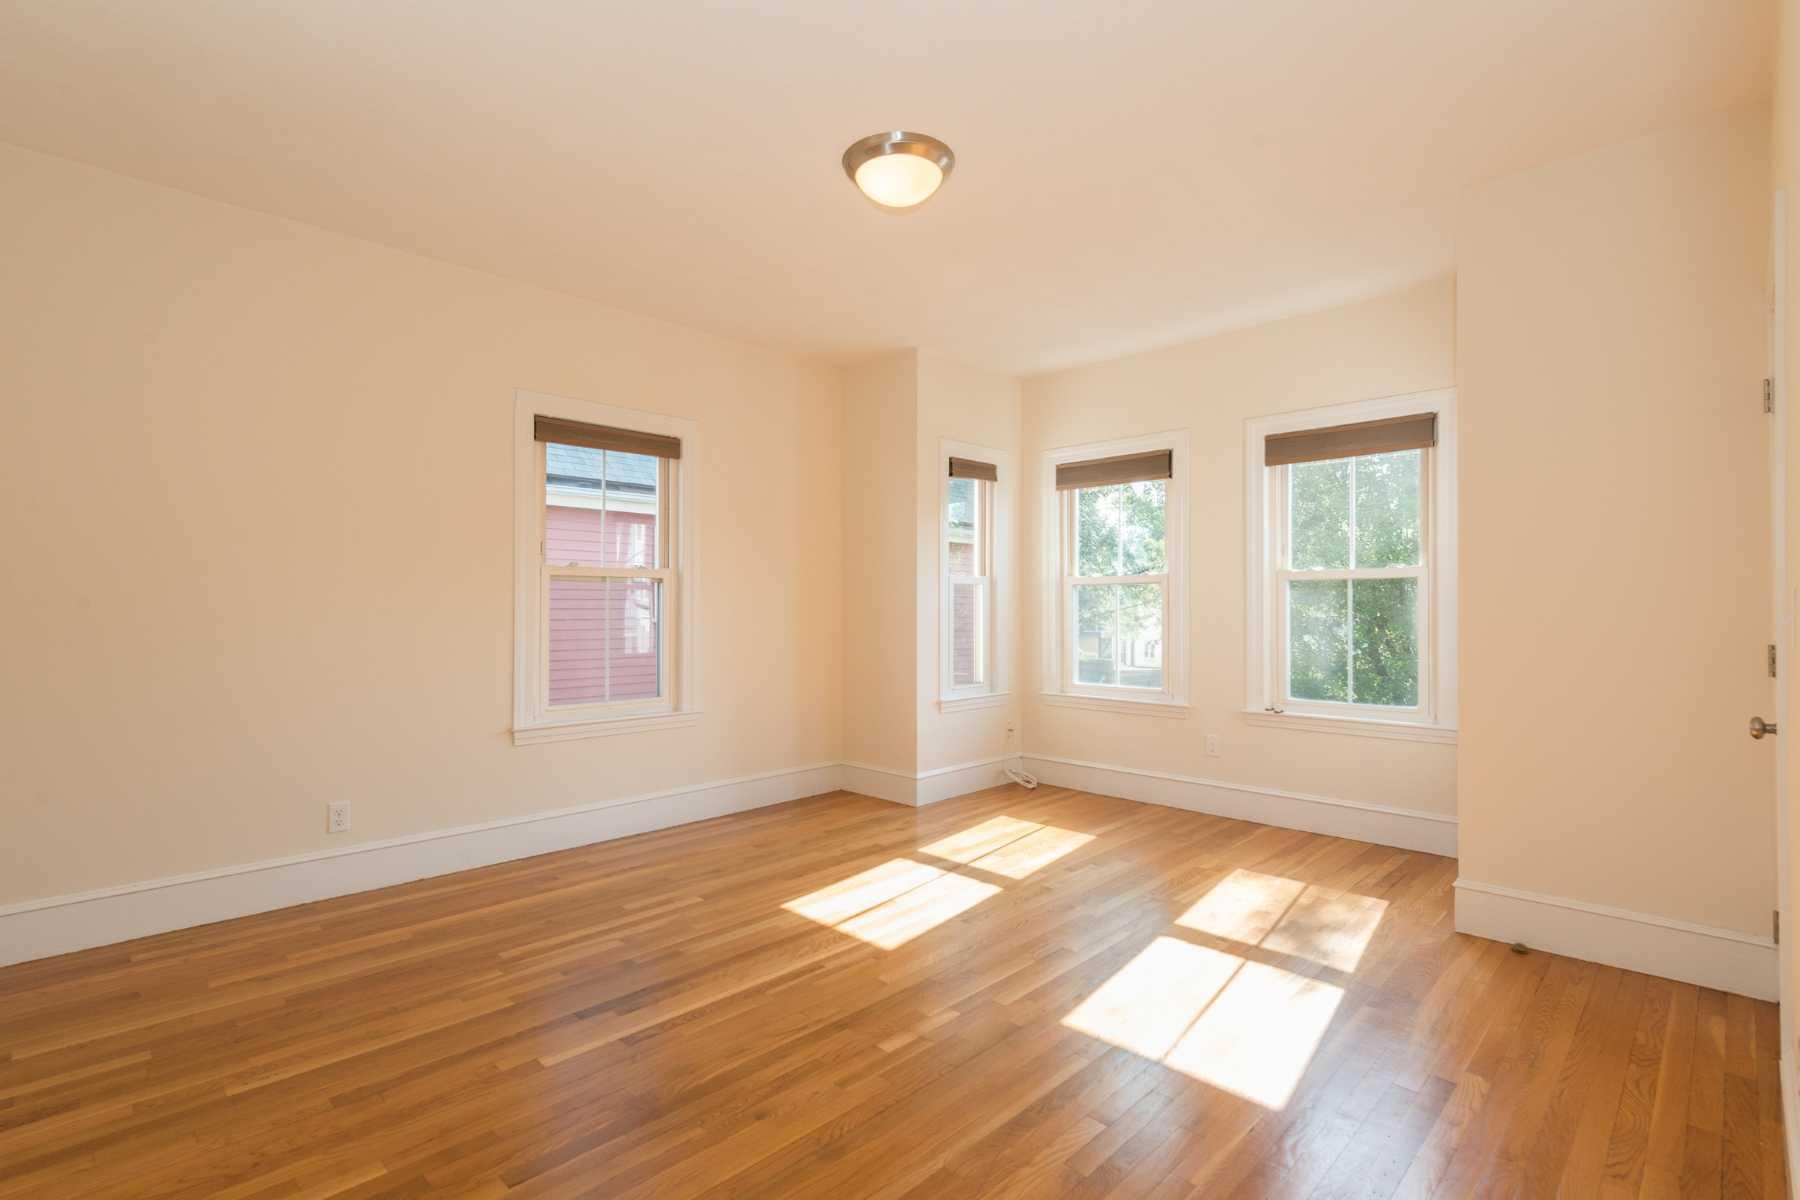 7-CapstoneCommunities-property-Dickinson-Street-Apartments-Somerville.jpg